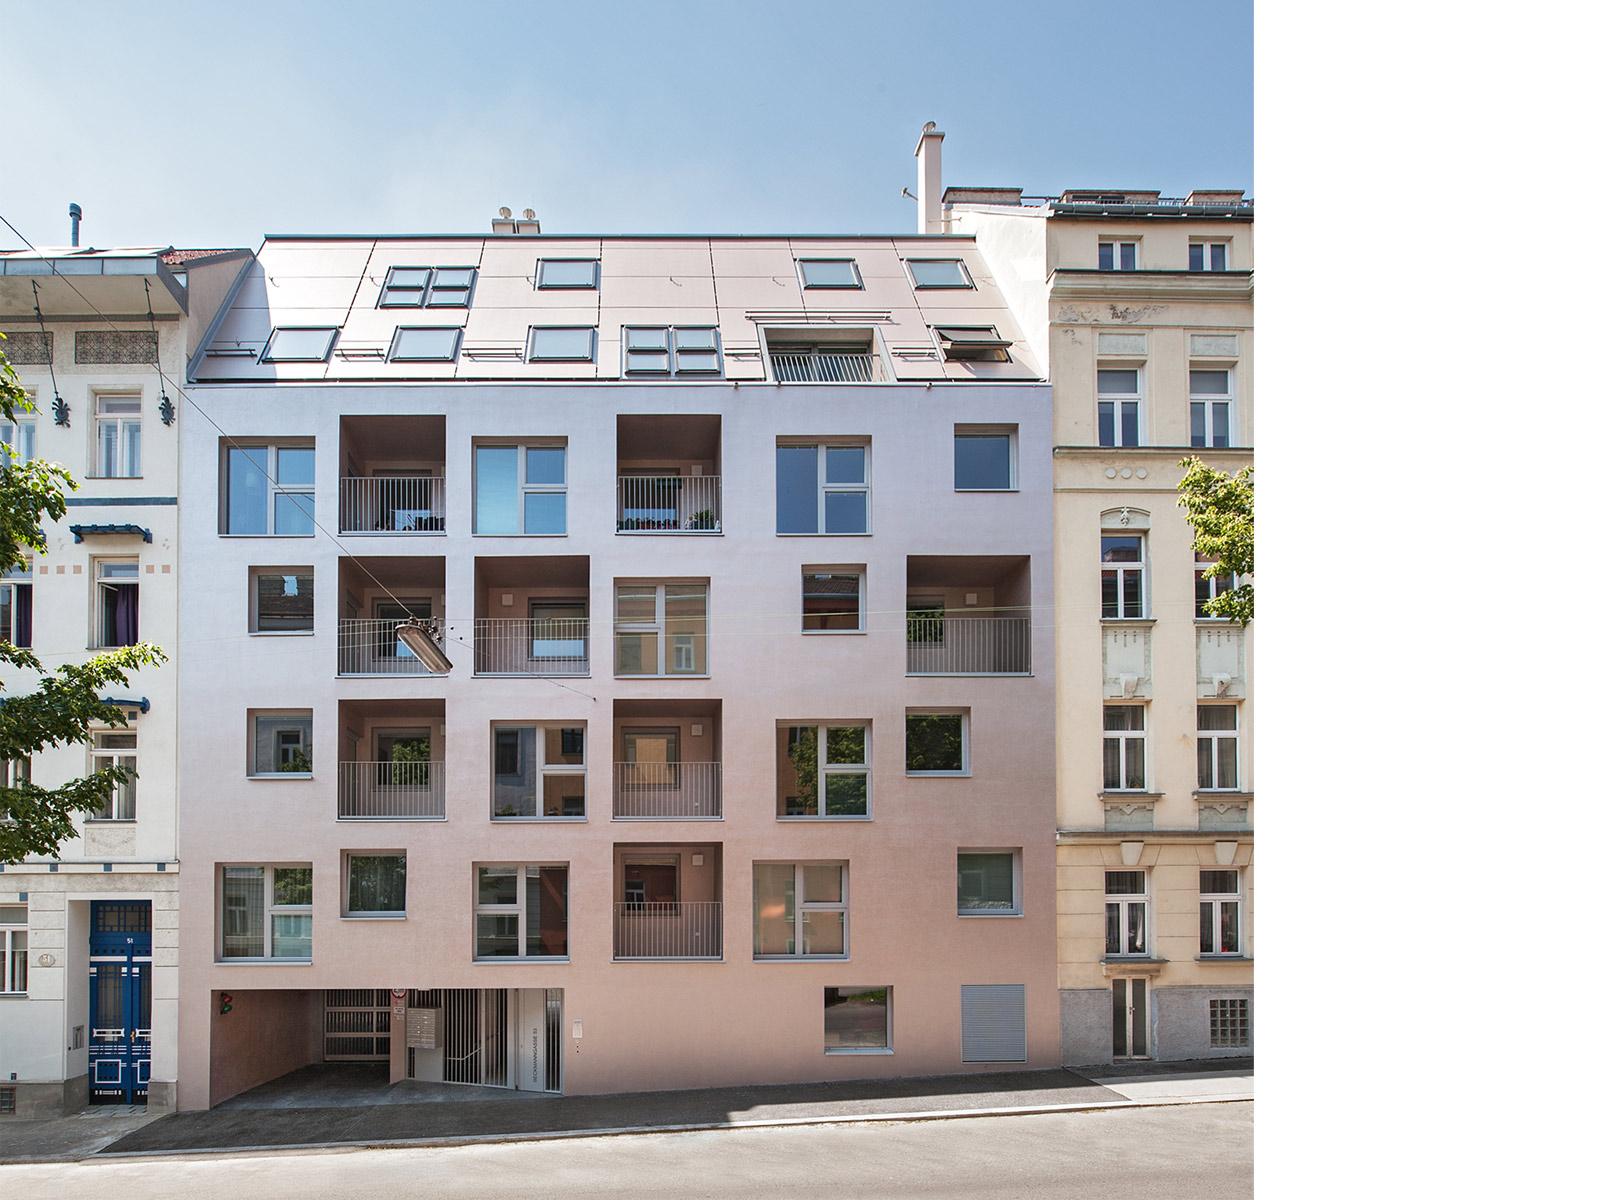 best architects architektur award nerma linsberger nerma linsberger wohnhaus. Black Bedroom Furniture Sets. Home Design Ideas